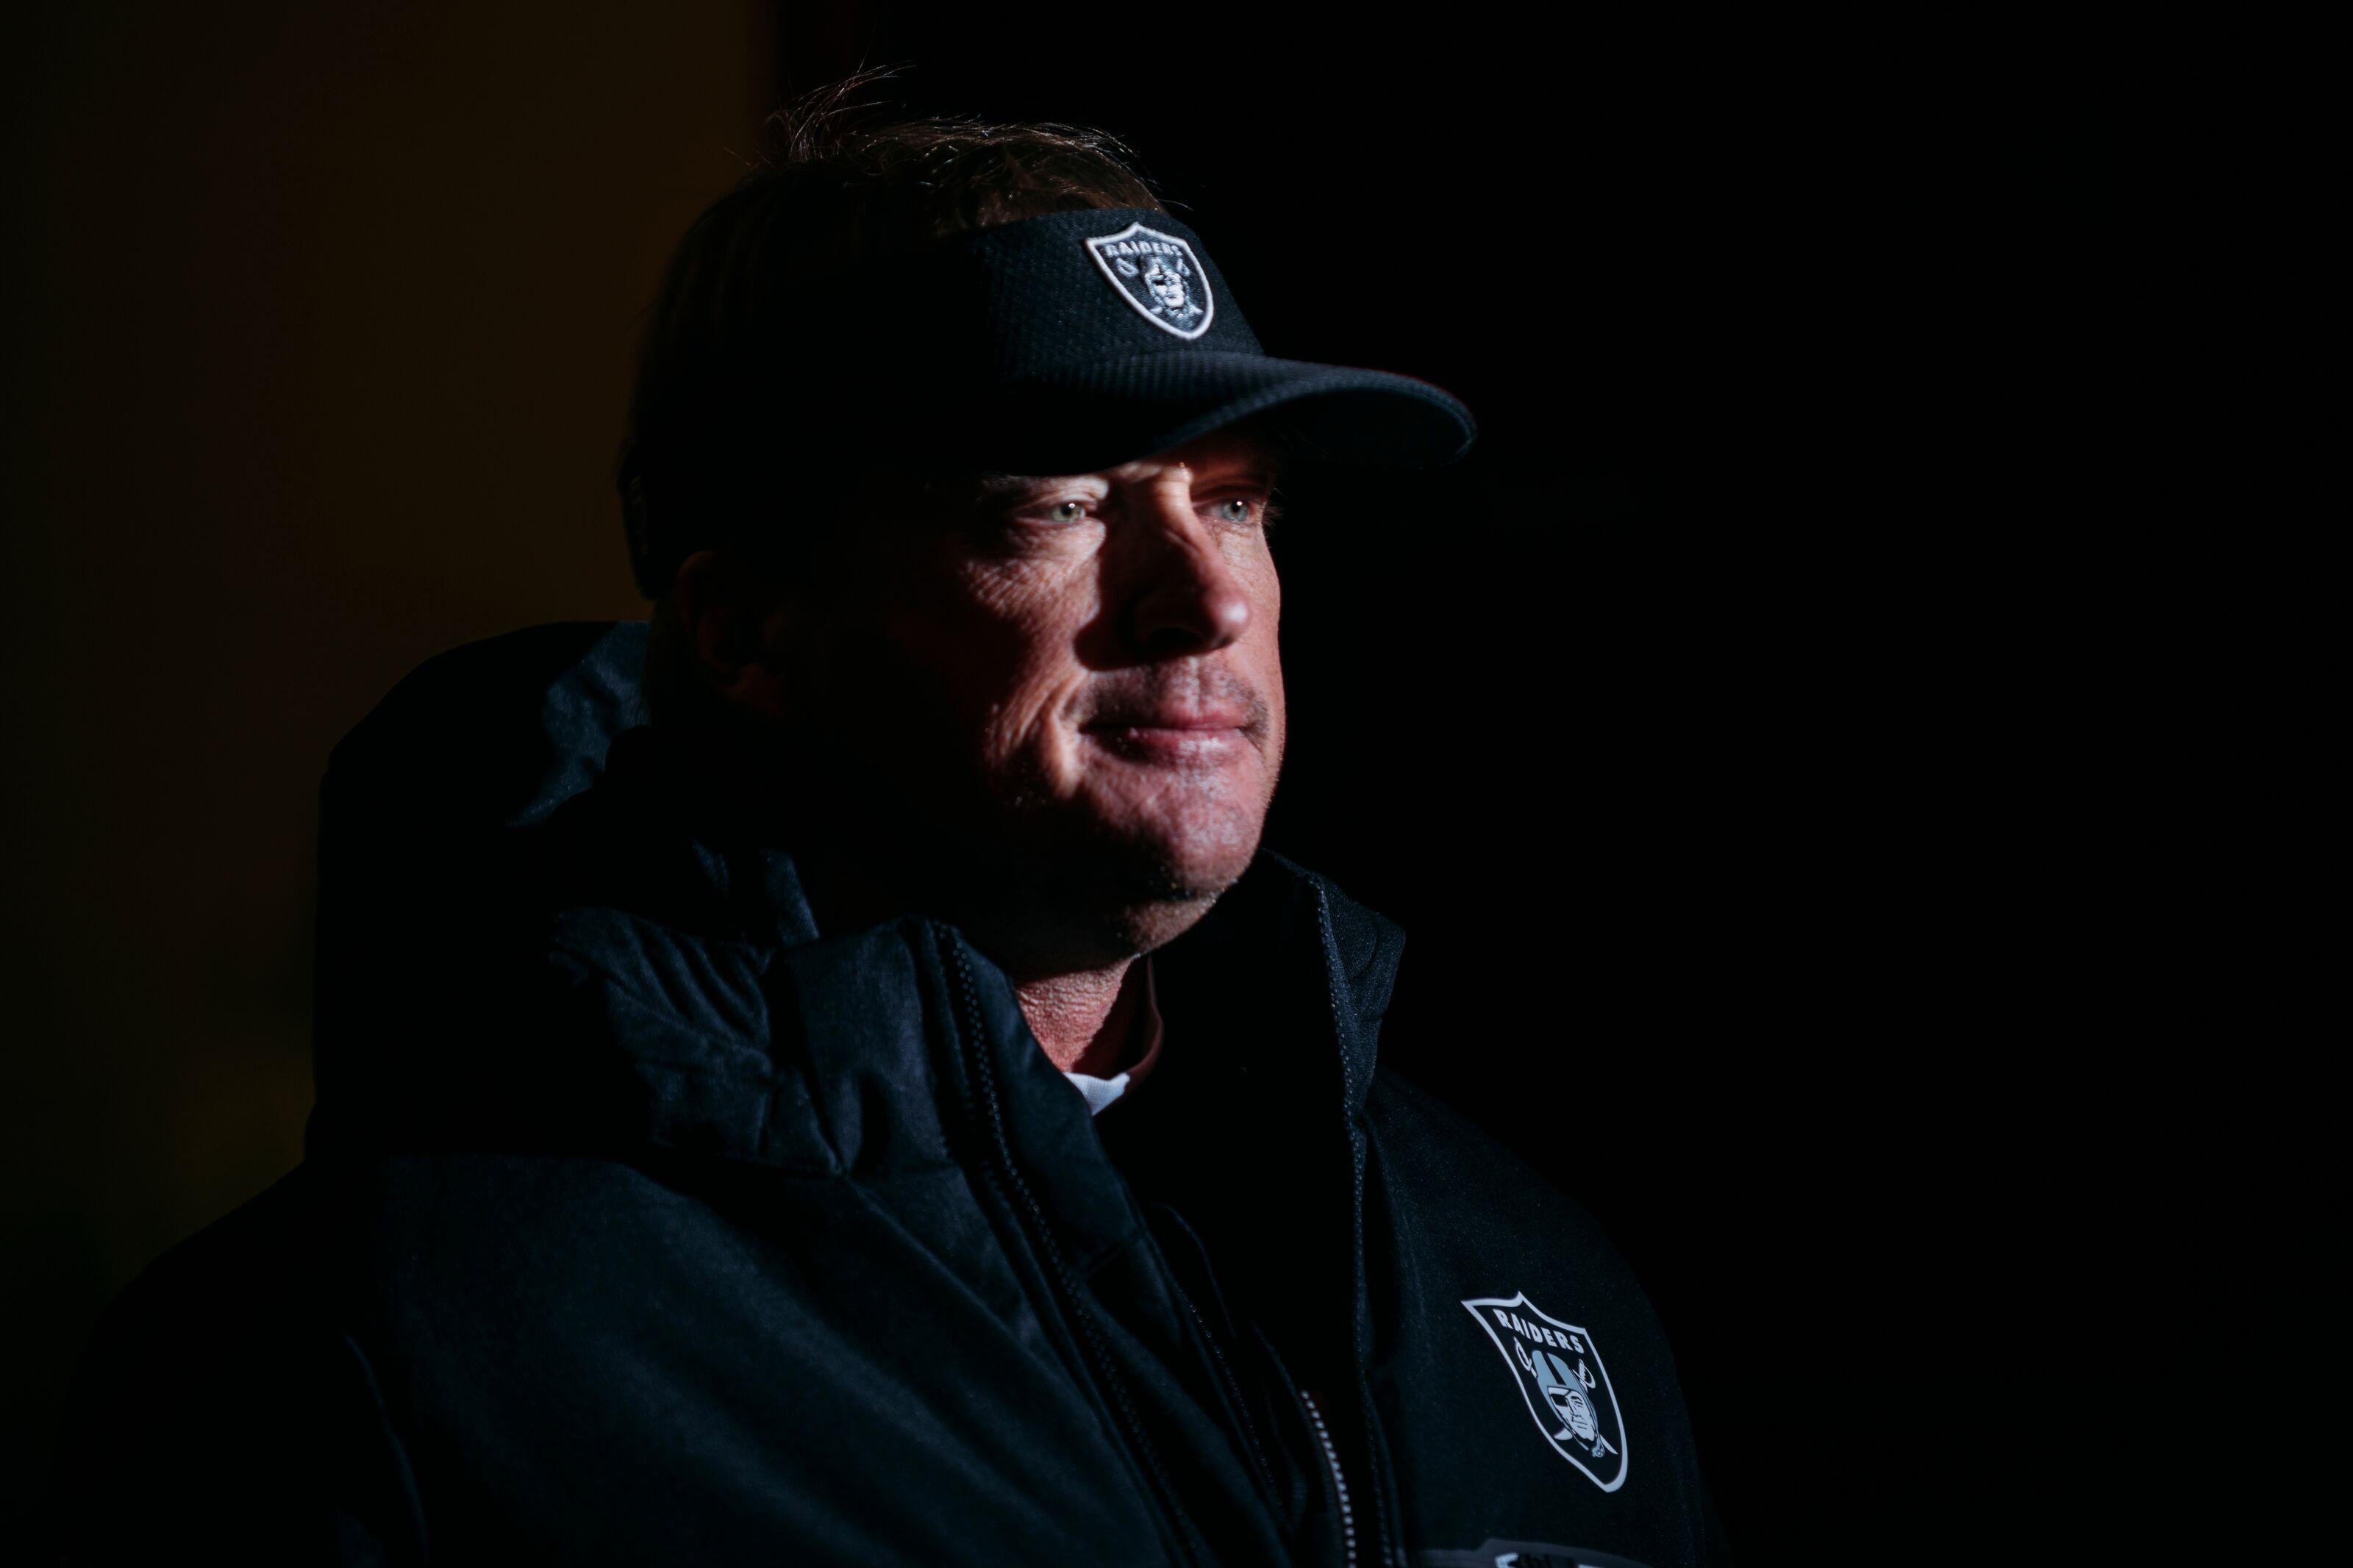 Oakland Raiders: Jon Gruden and Mike Mayock pull bizarre move